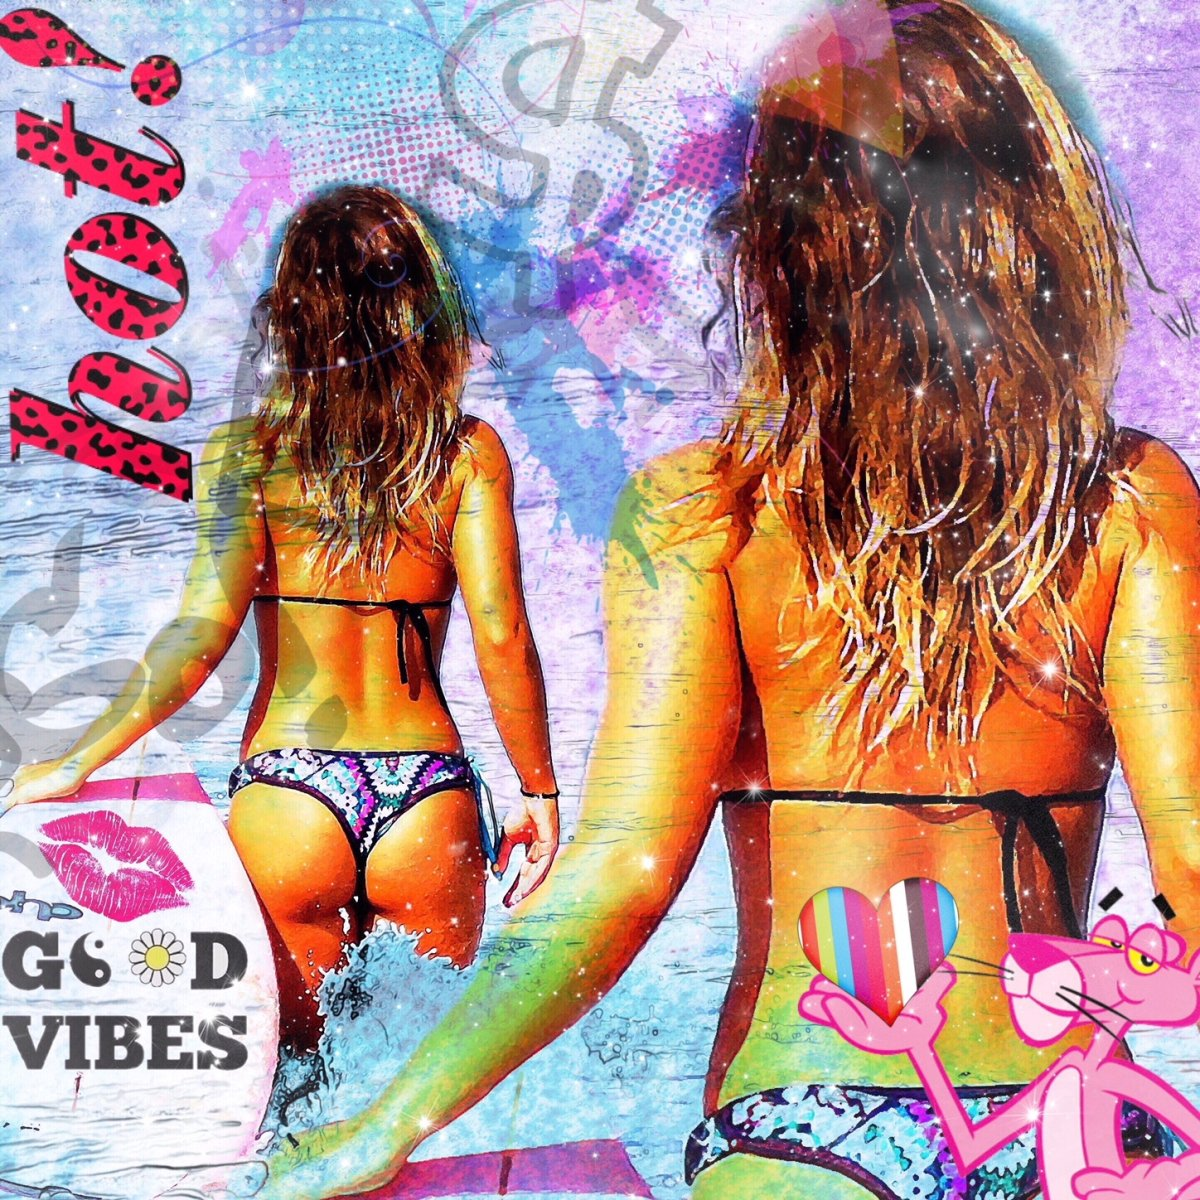 goodvibes-pappestellbrink-popart-popstreetshop